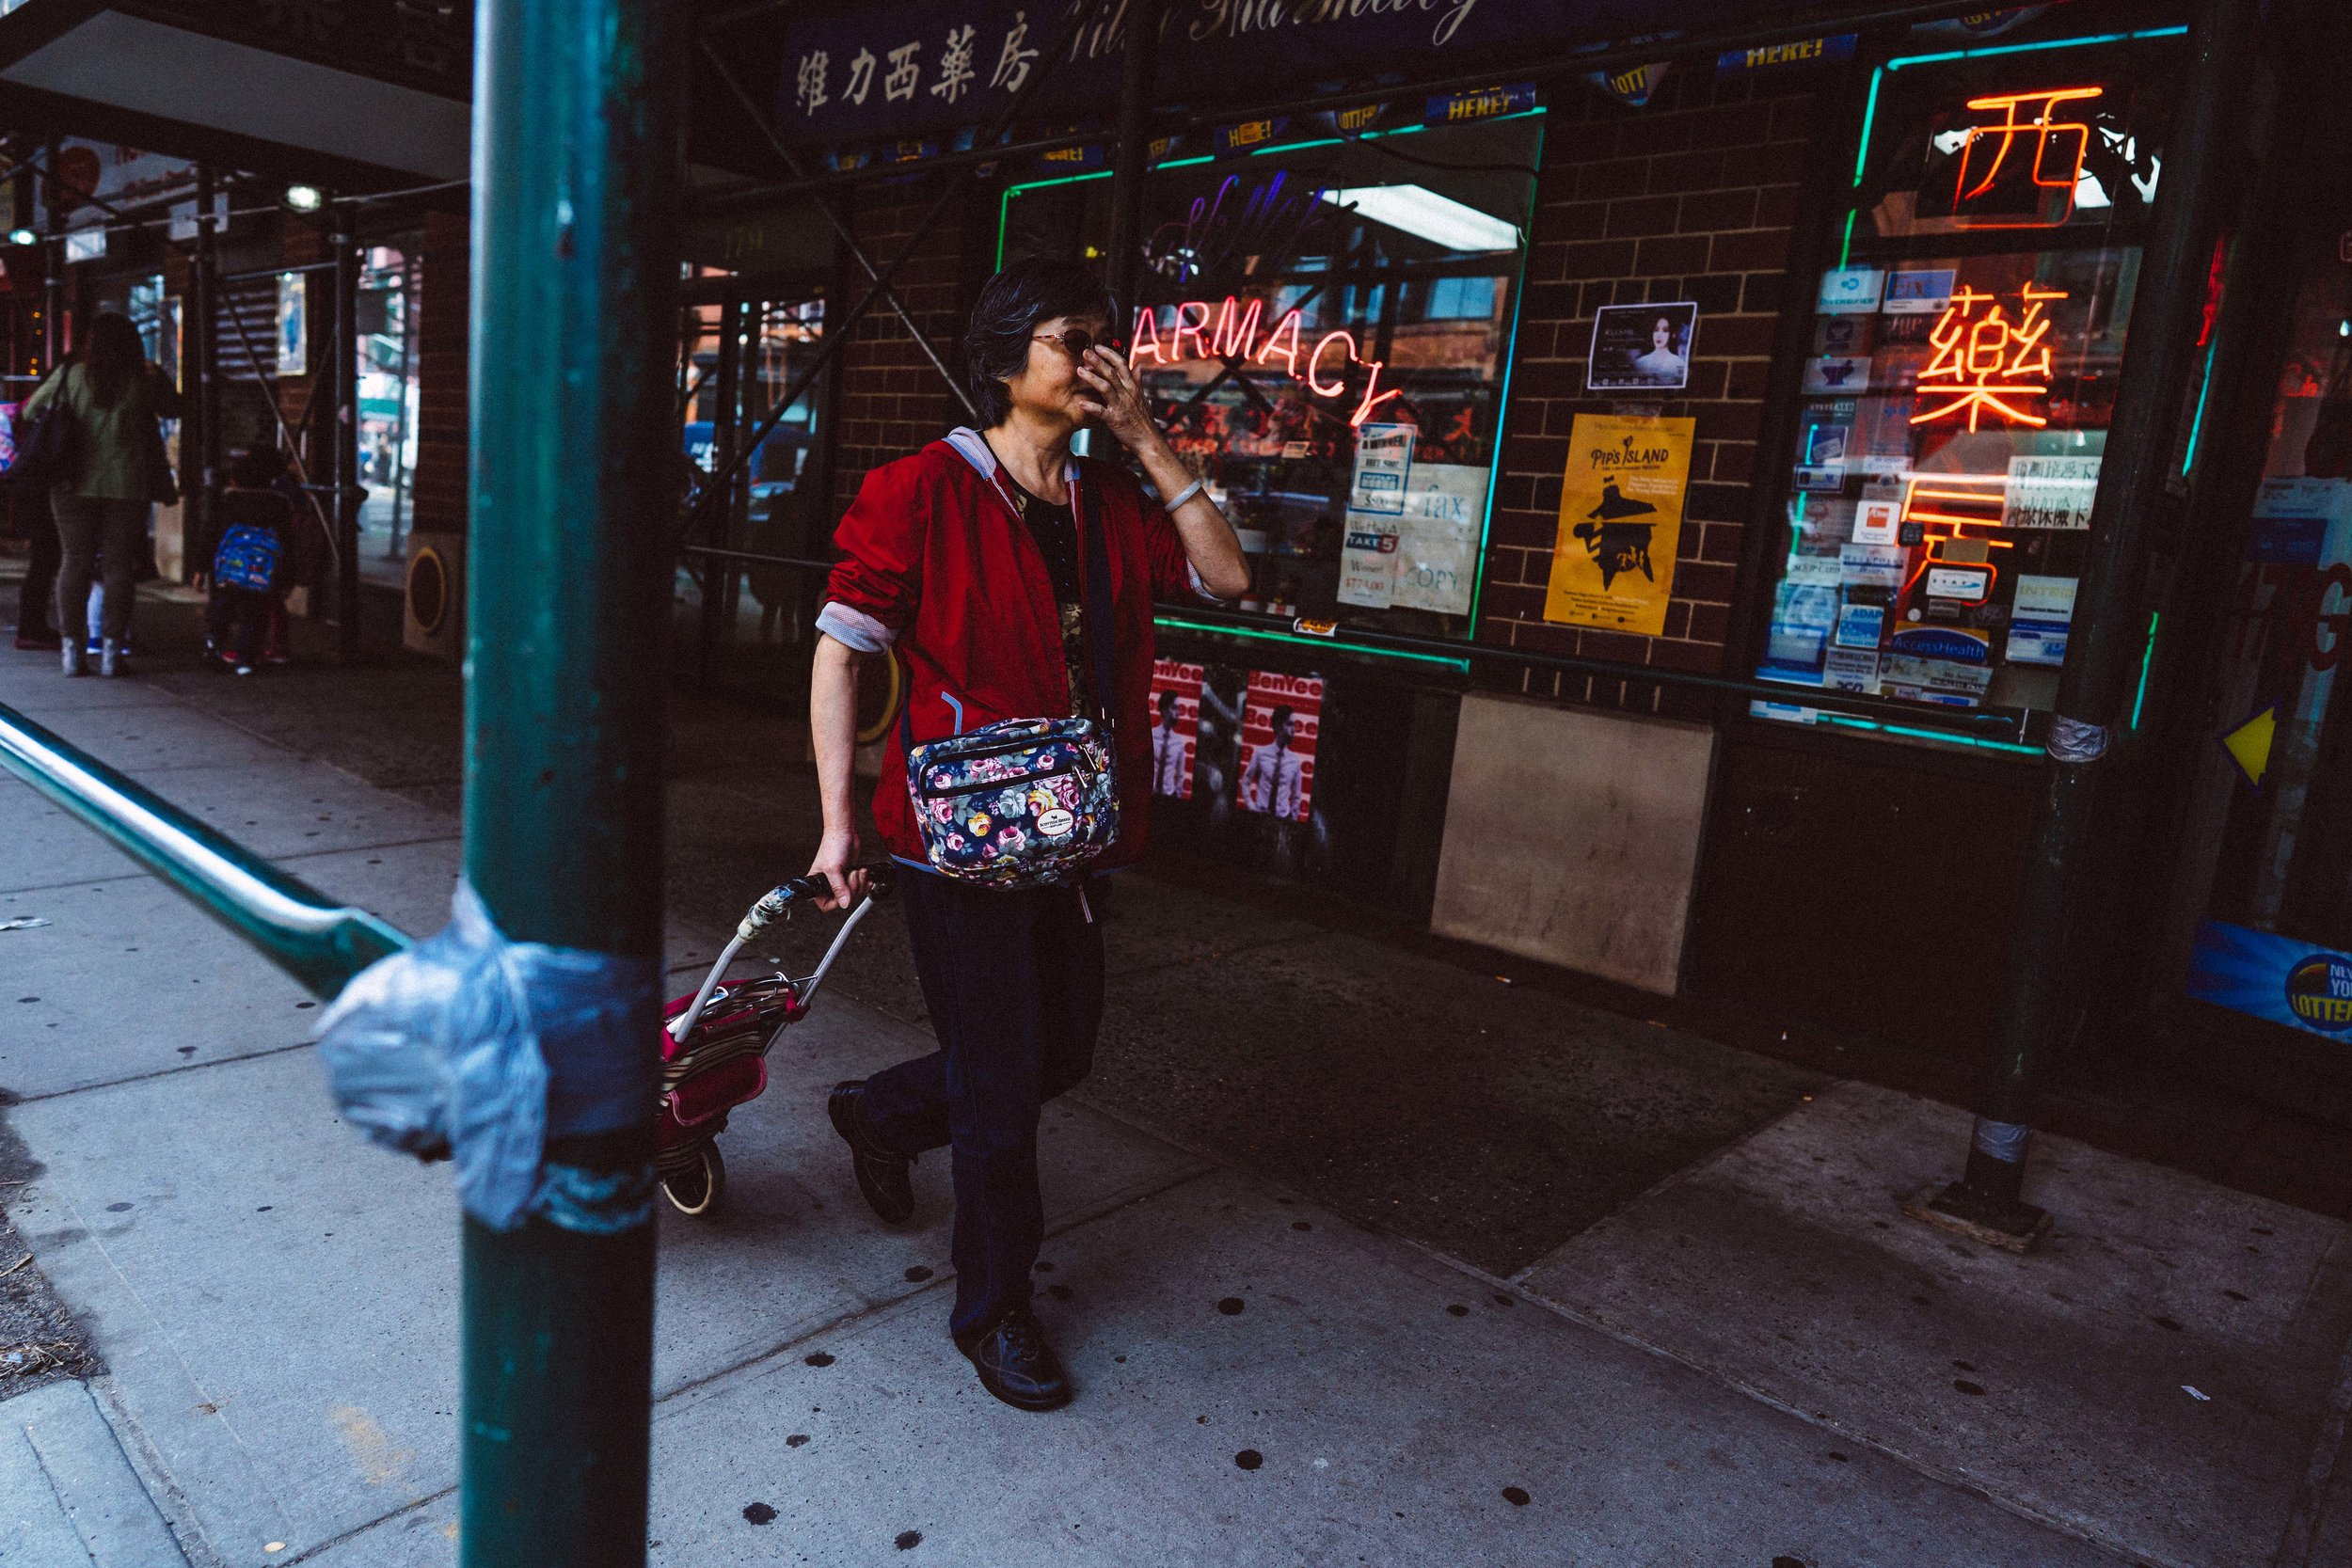 newyork-sony-102439.jpg